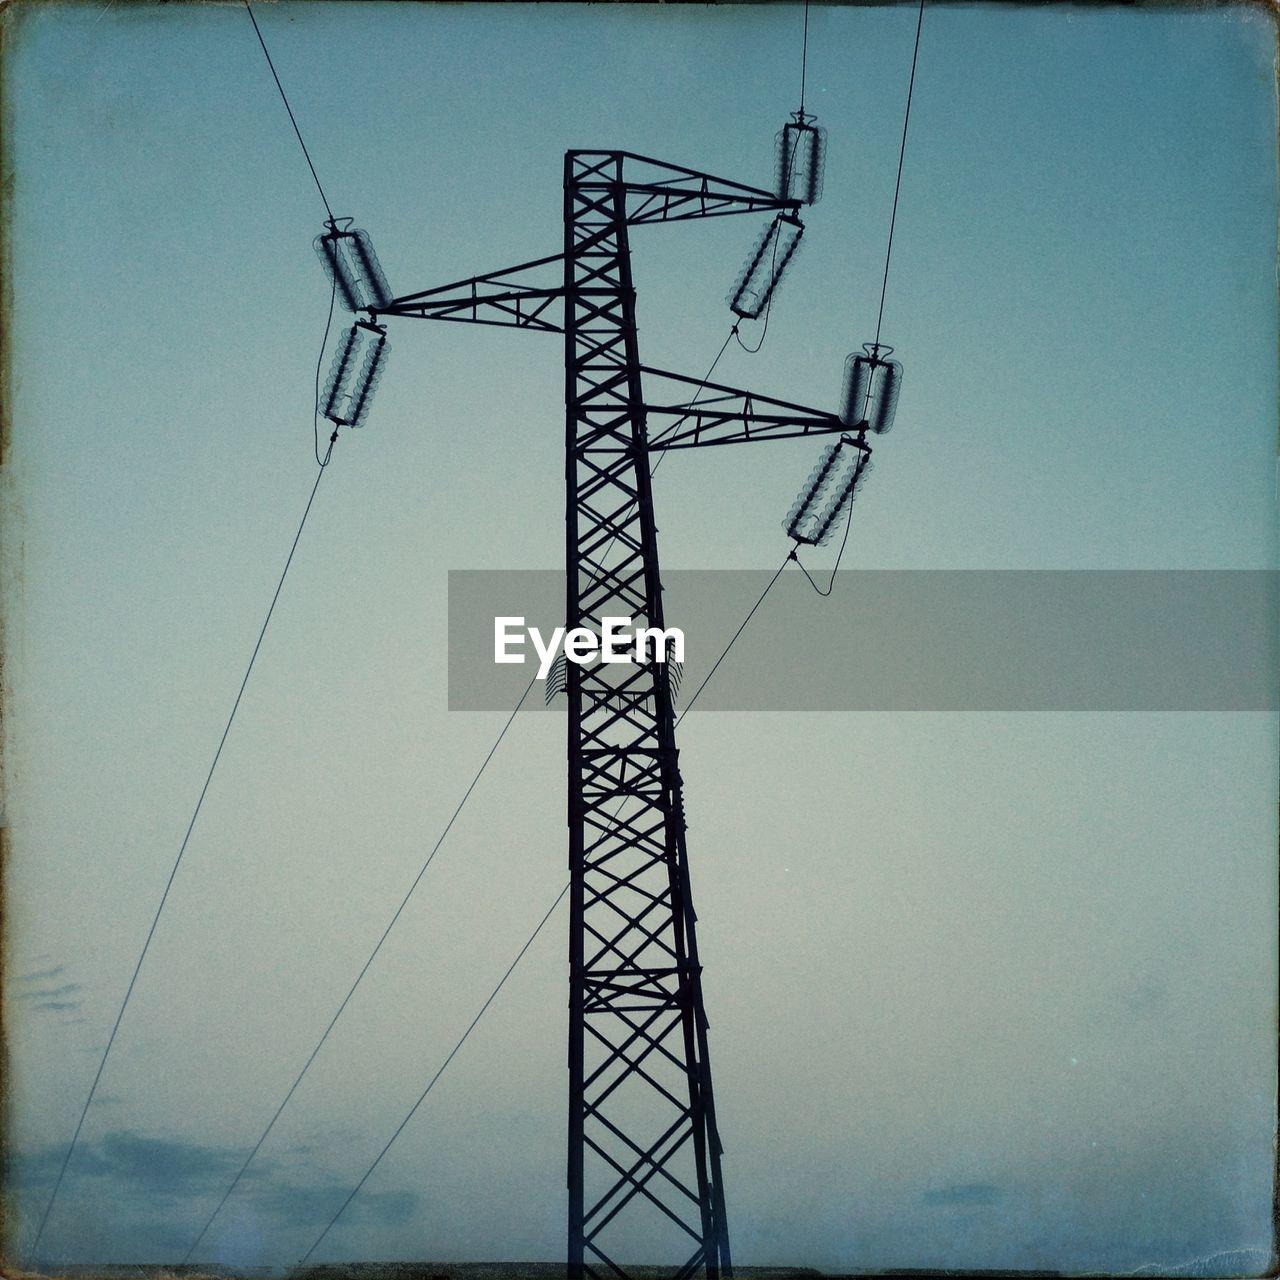 Silhouette electricity pylon at dusk